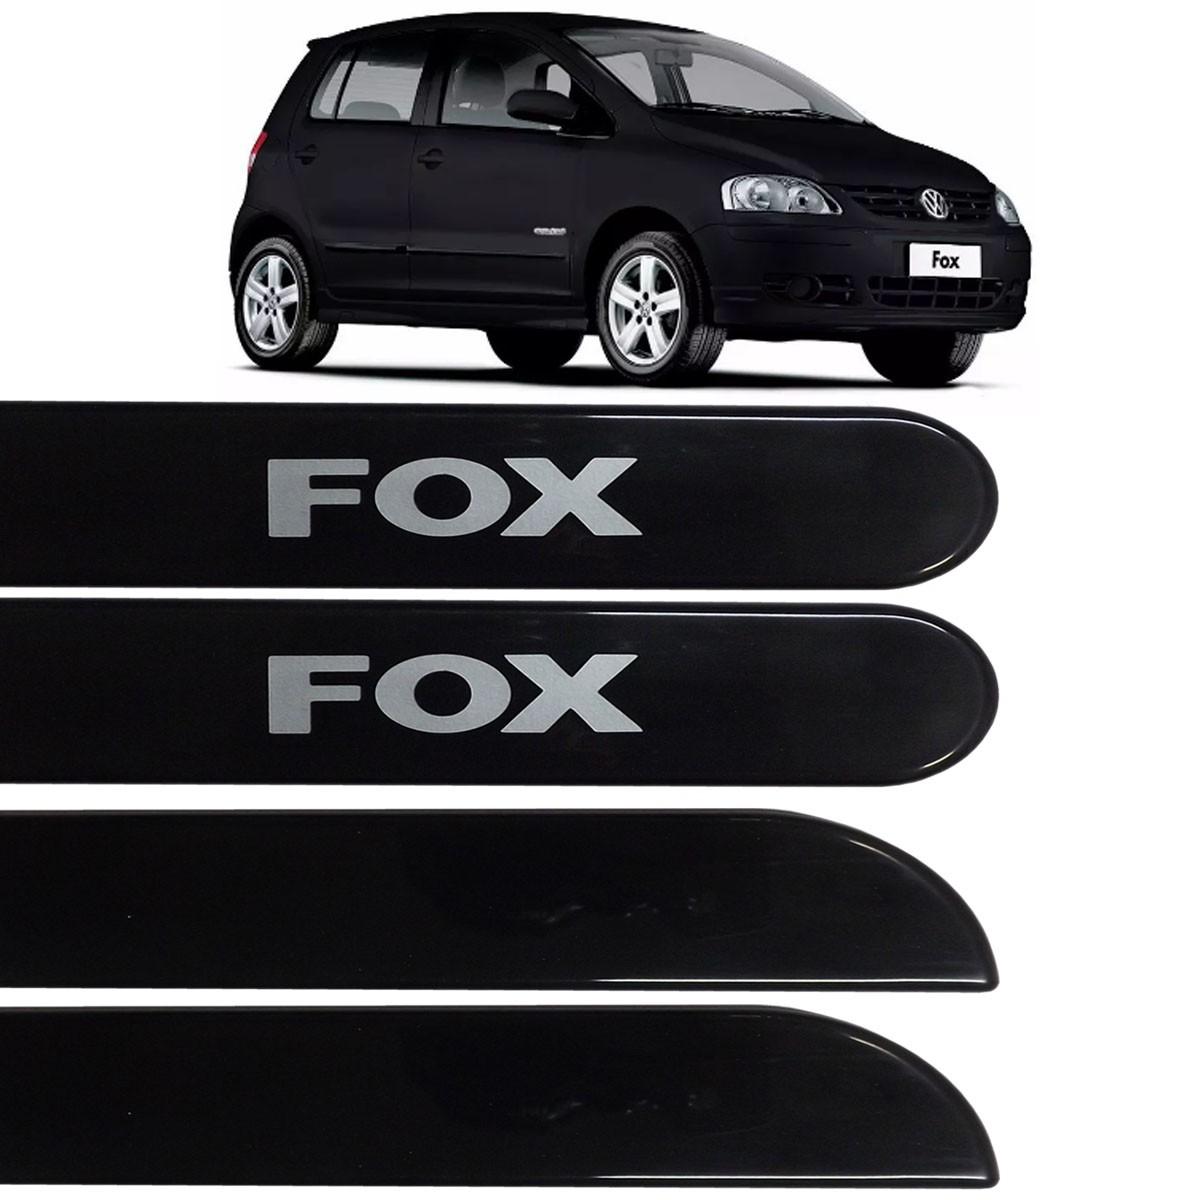 Jogo Friso Lateral Fox 04 Portas 2003 até 2016 Preto Ninja